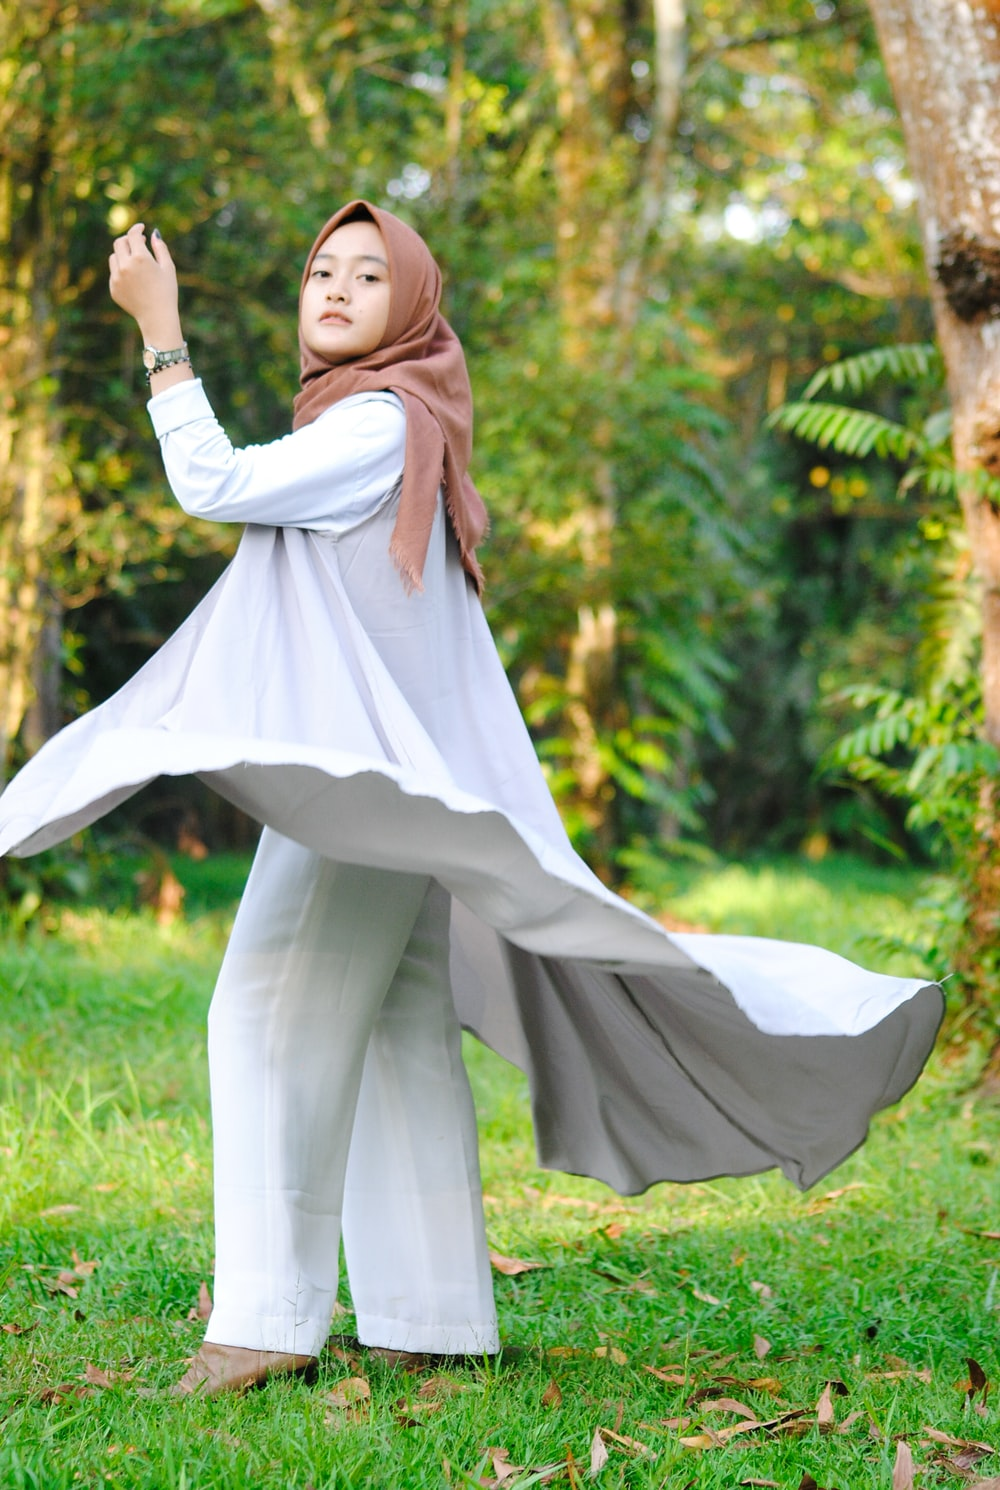 woman flipiing her dress